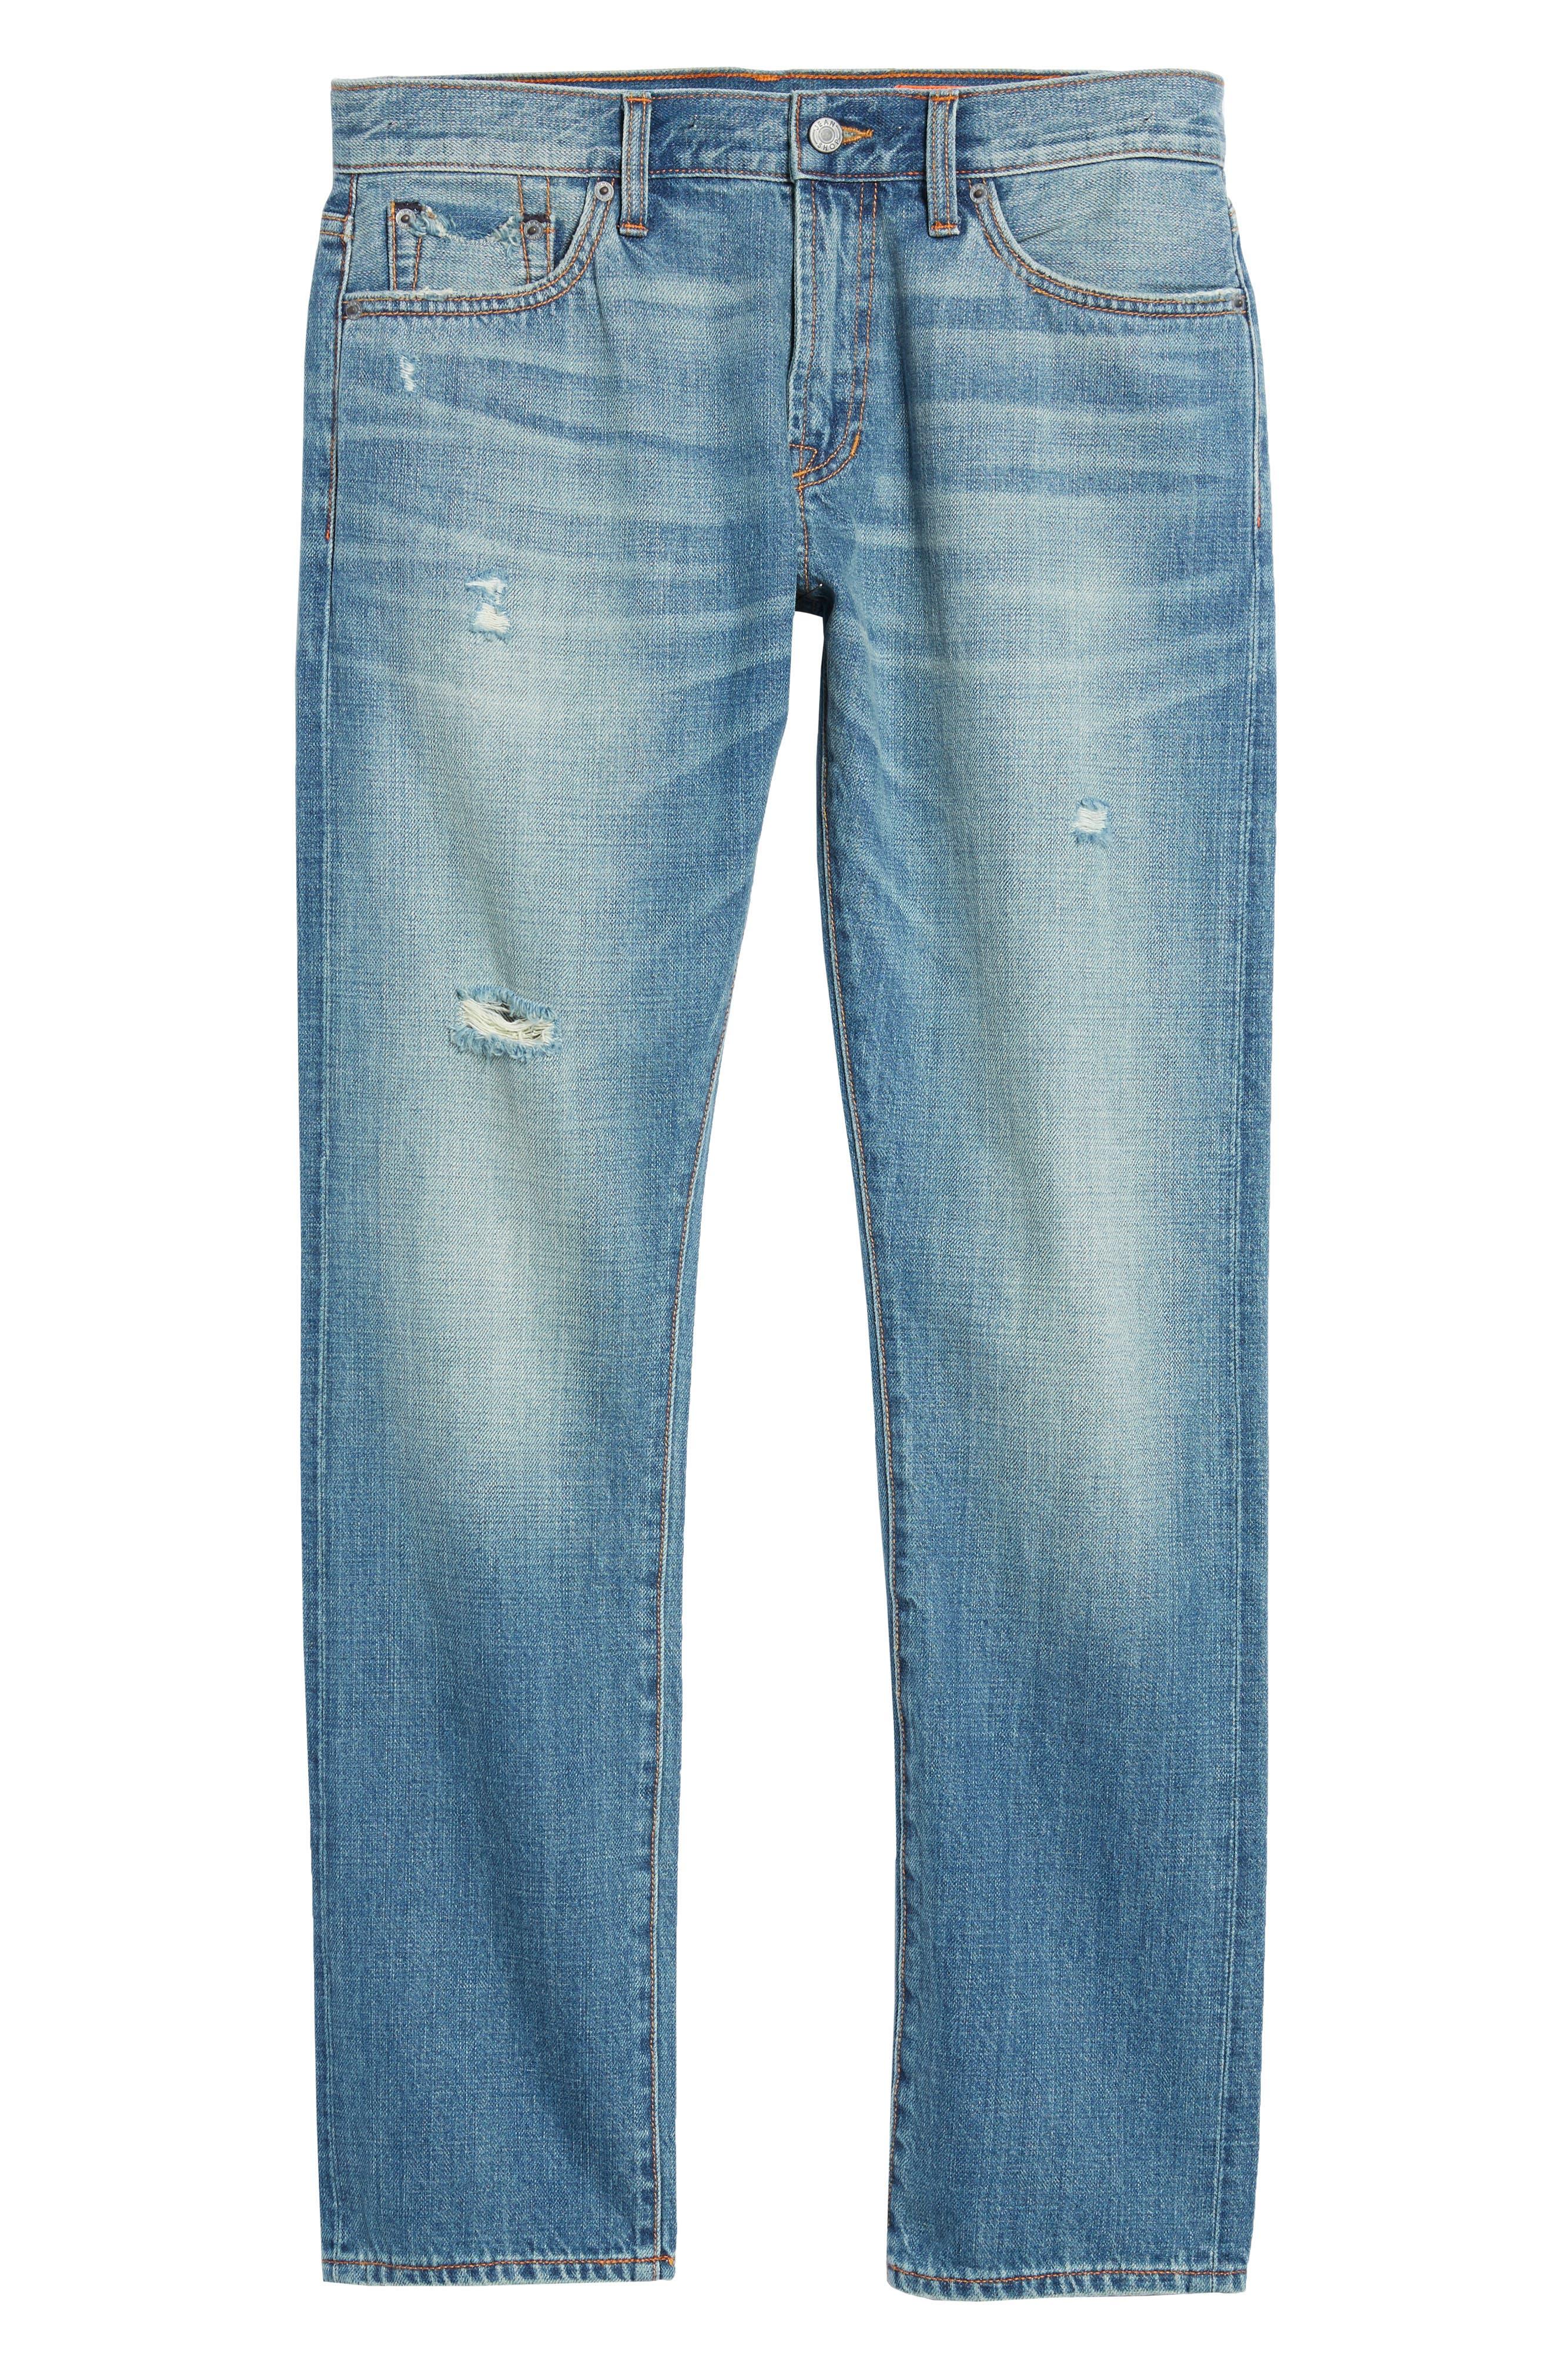 Mick Slim Straight Leg Jeans,                             Alternate thumbnail 6, color,                             400